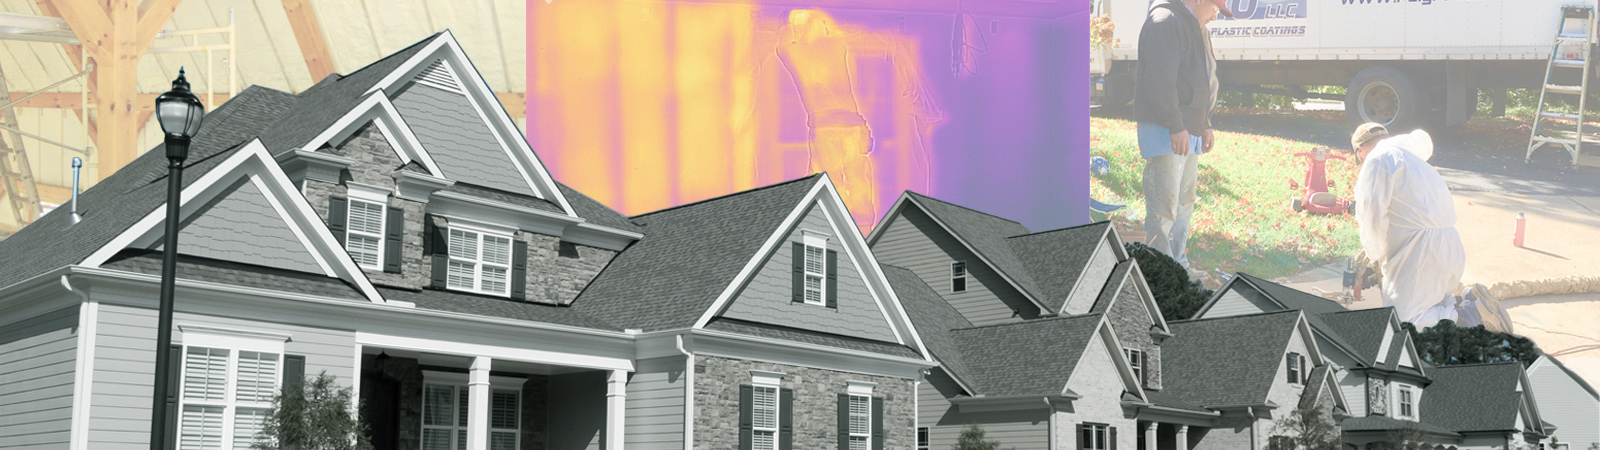 Virginia Spray Foam Insulation Contractor and VA Concrete